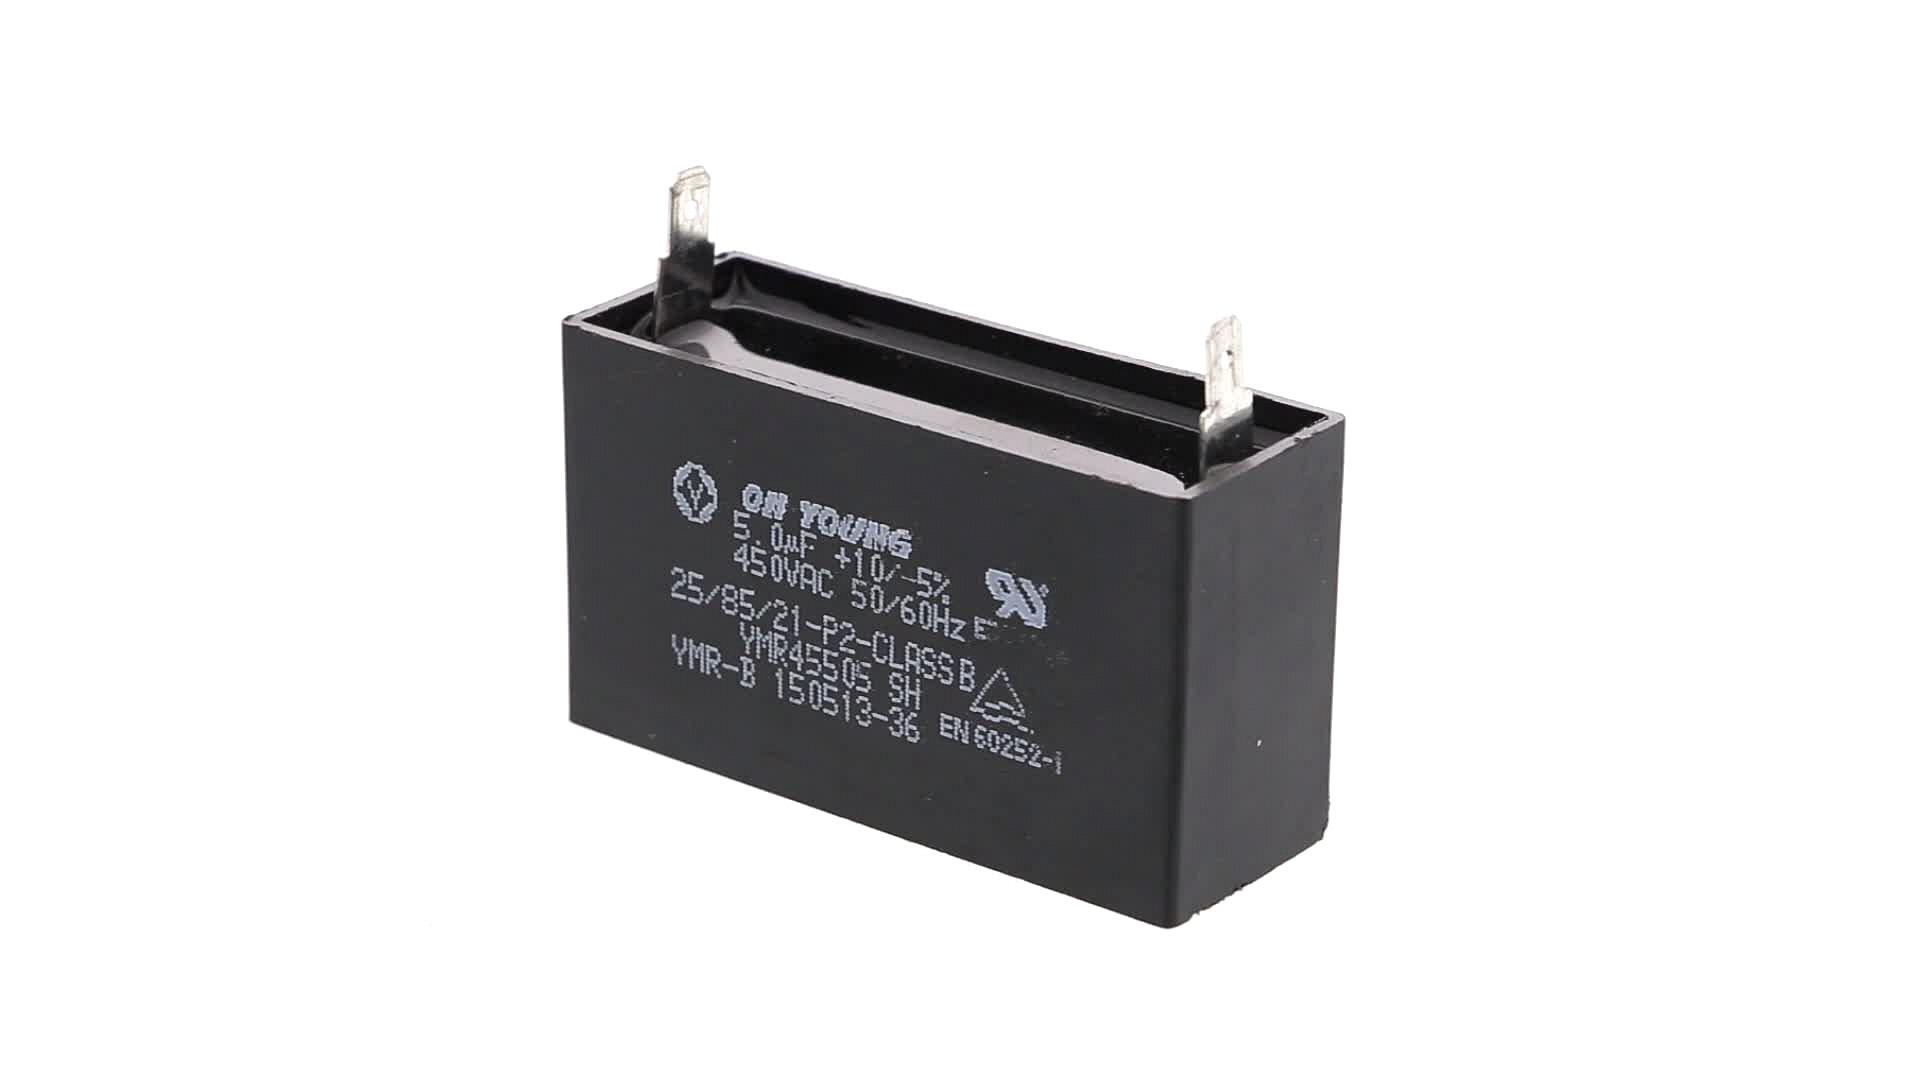 CONDENSATEUR Froid 5uF 450V YMR45505  SH - 1